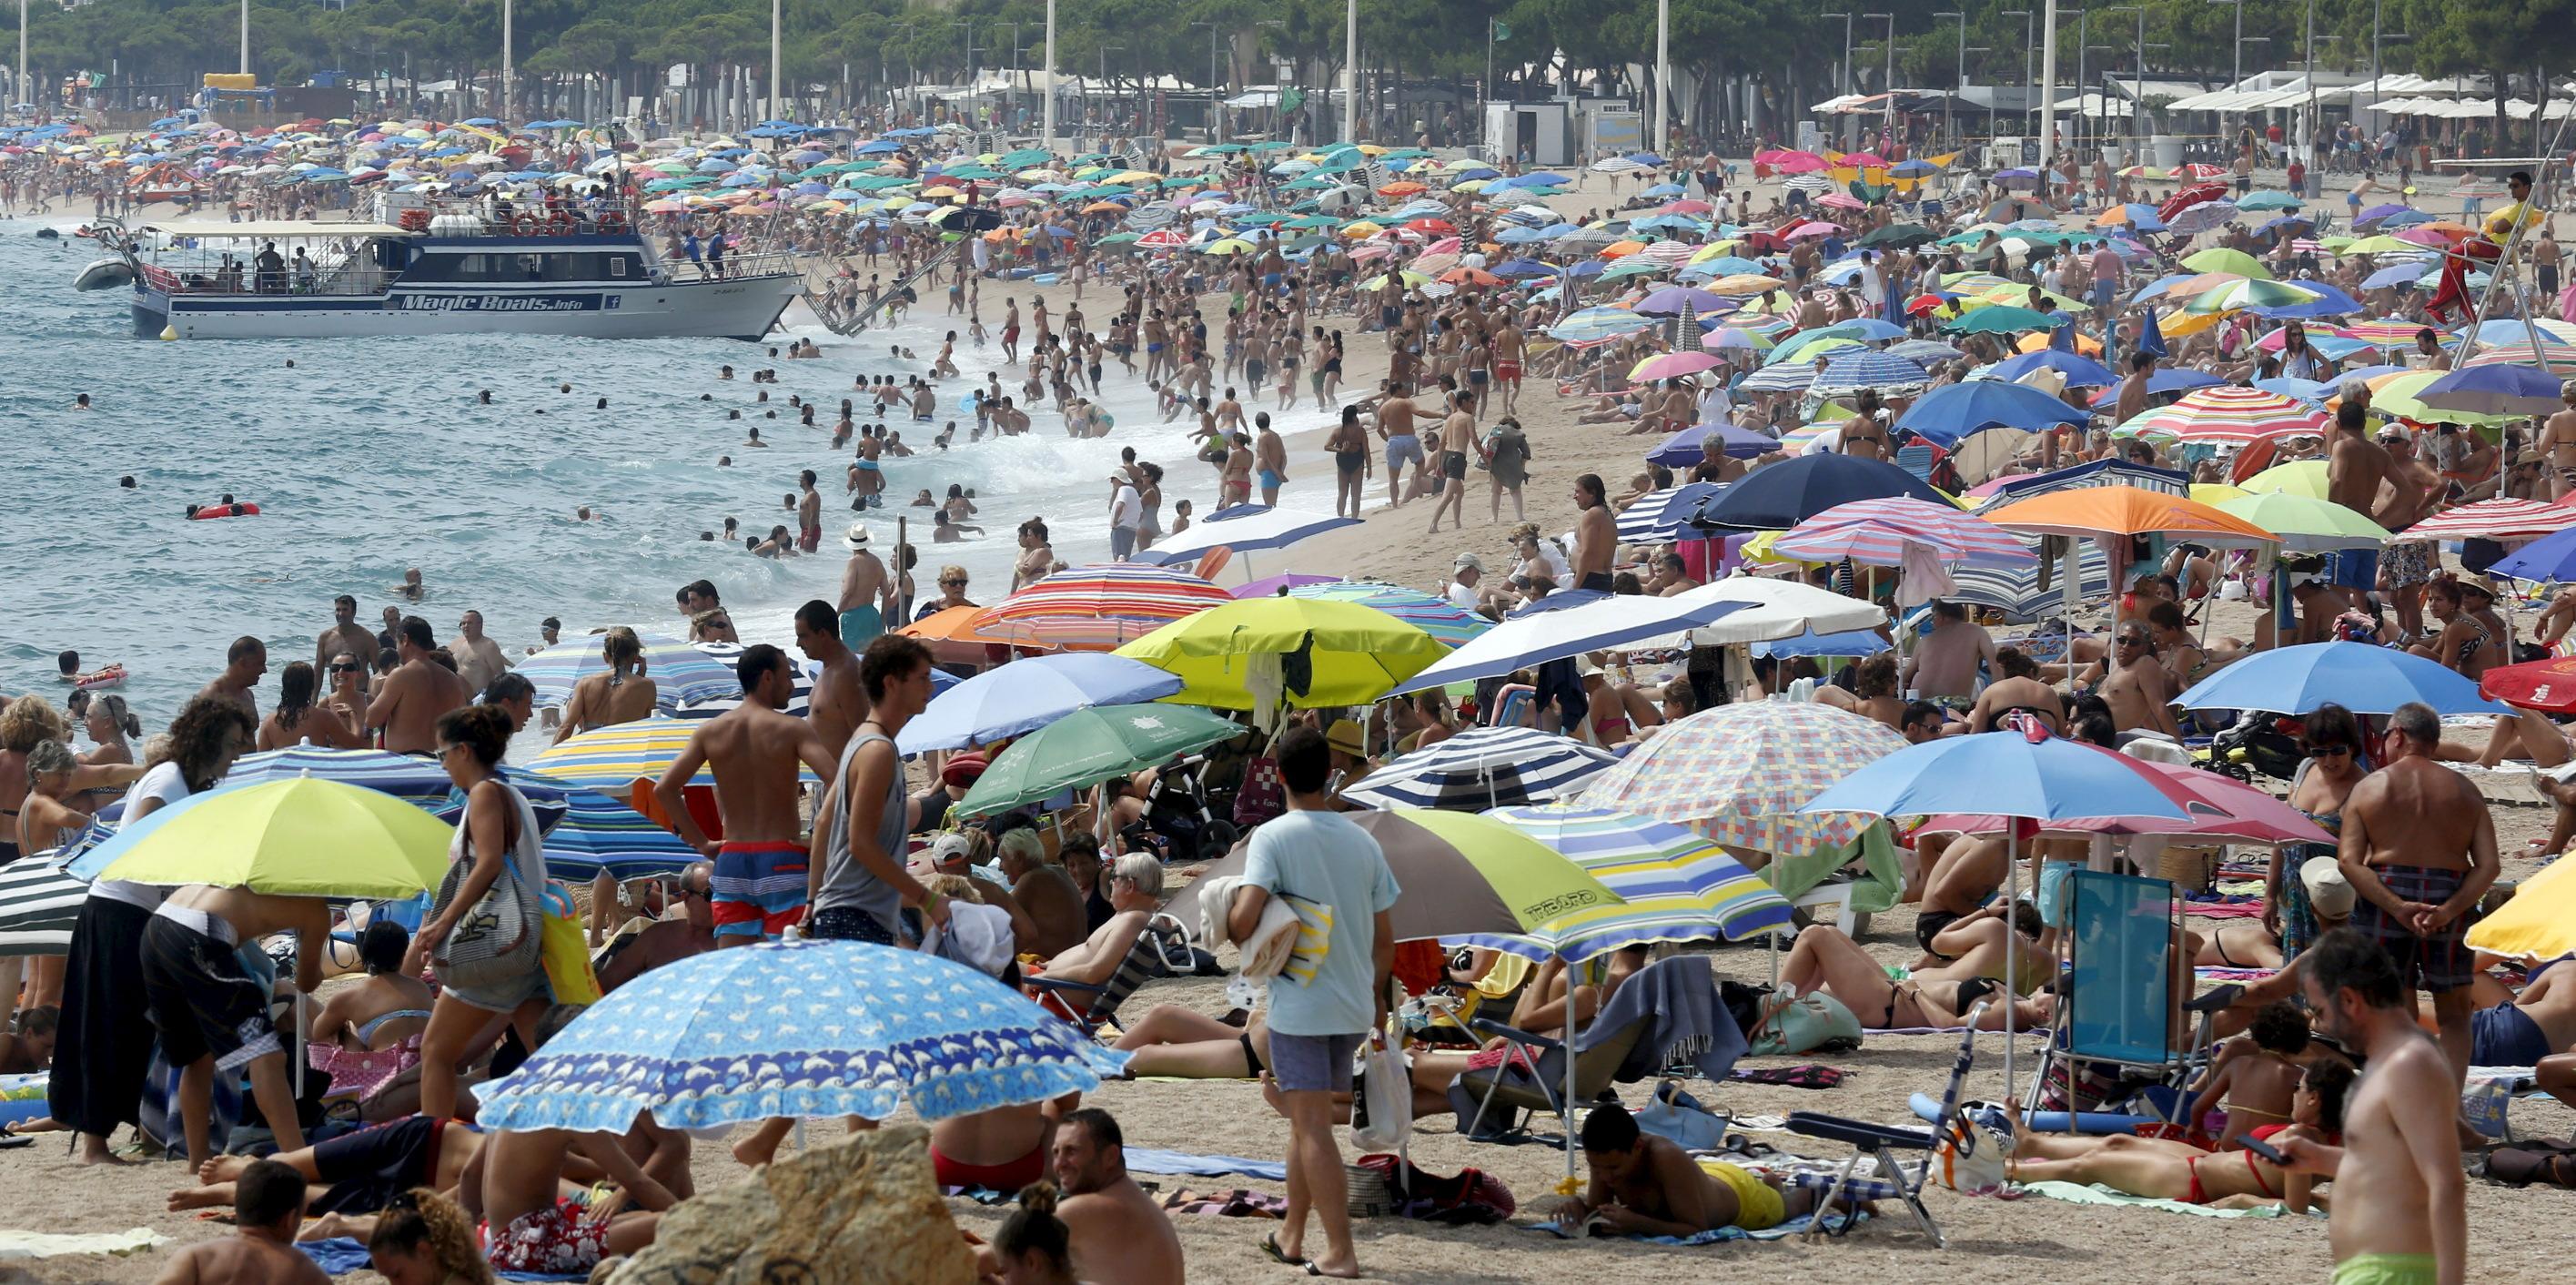 Prekrcana plaža u blizini Barcelone